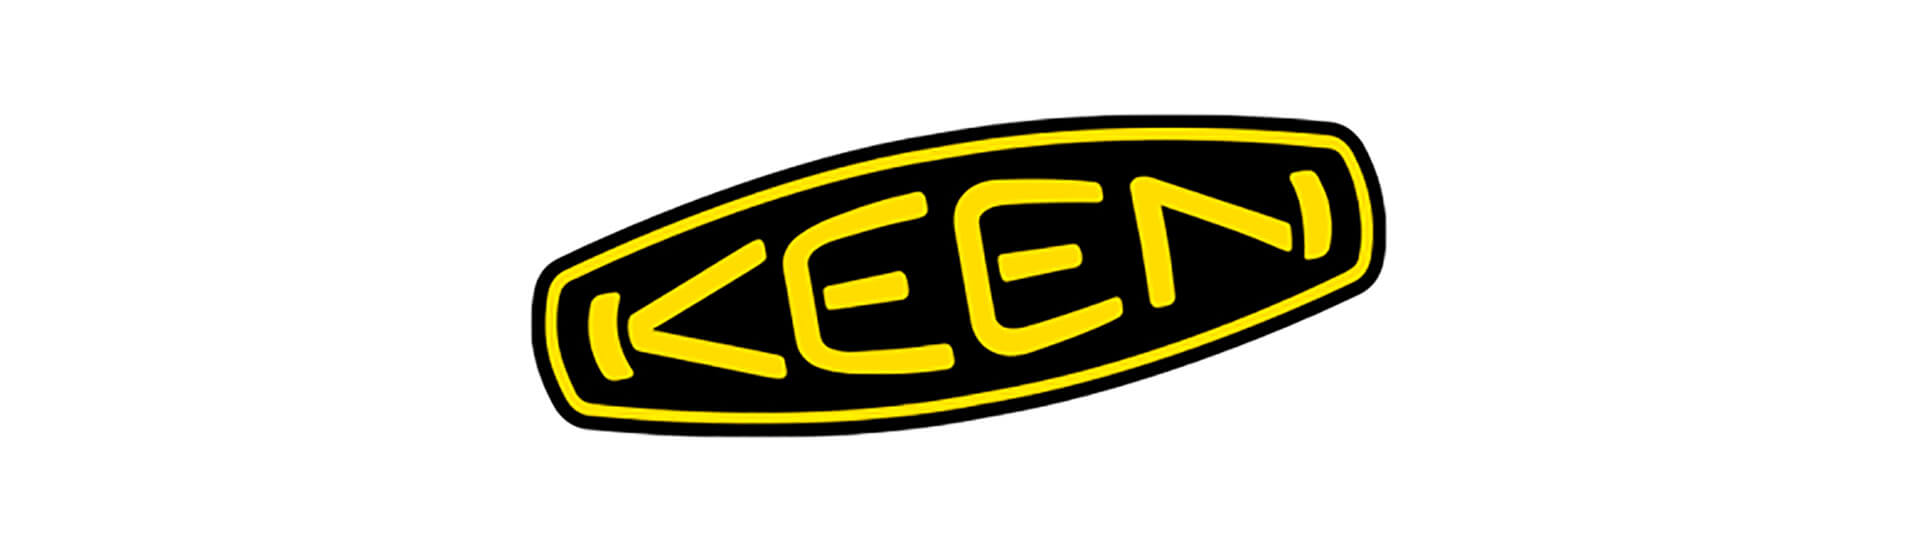 「KEEN」の期間限定イベント